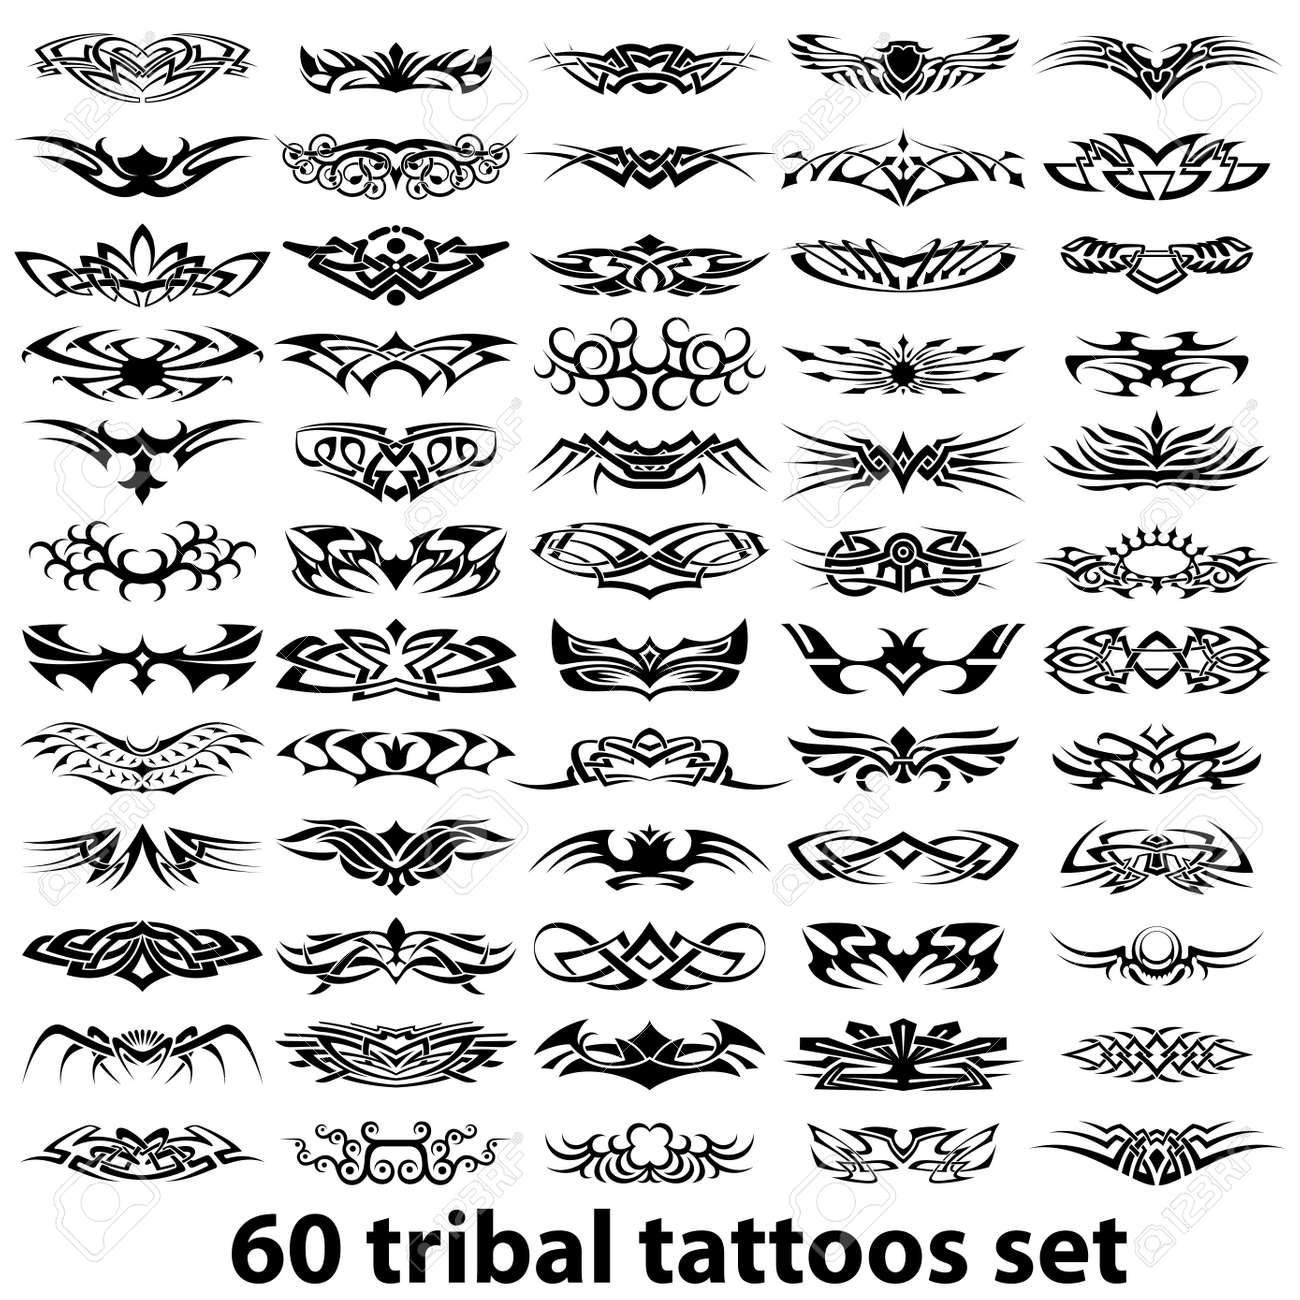 Tribal-Tattoos 13068698-60-various-tribal-tattoos-Stock-Vector-tribal-tattoo-design